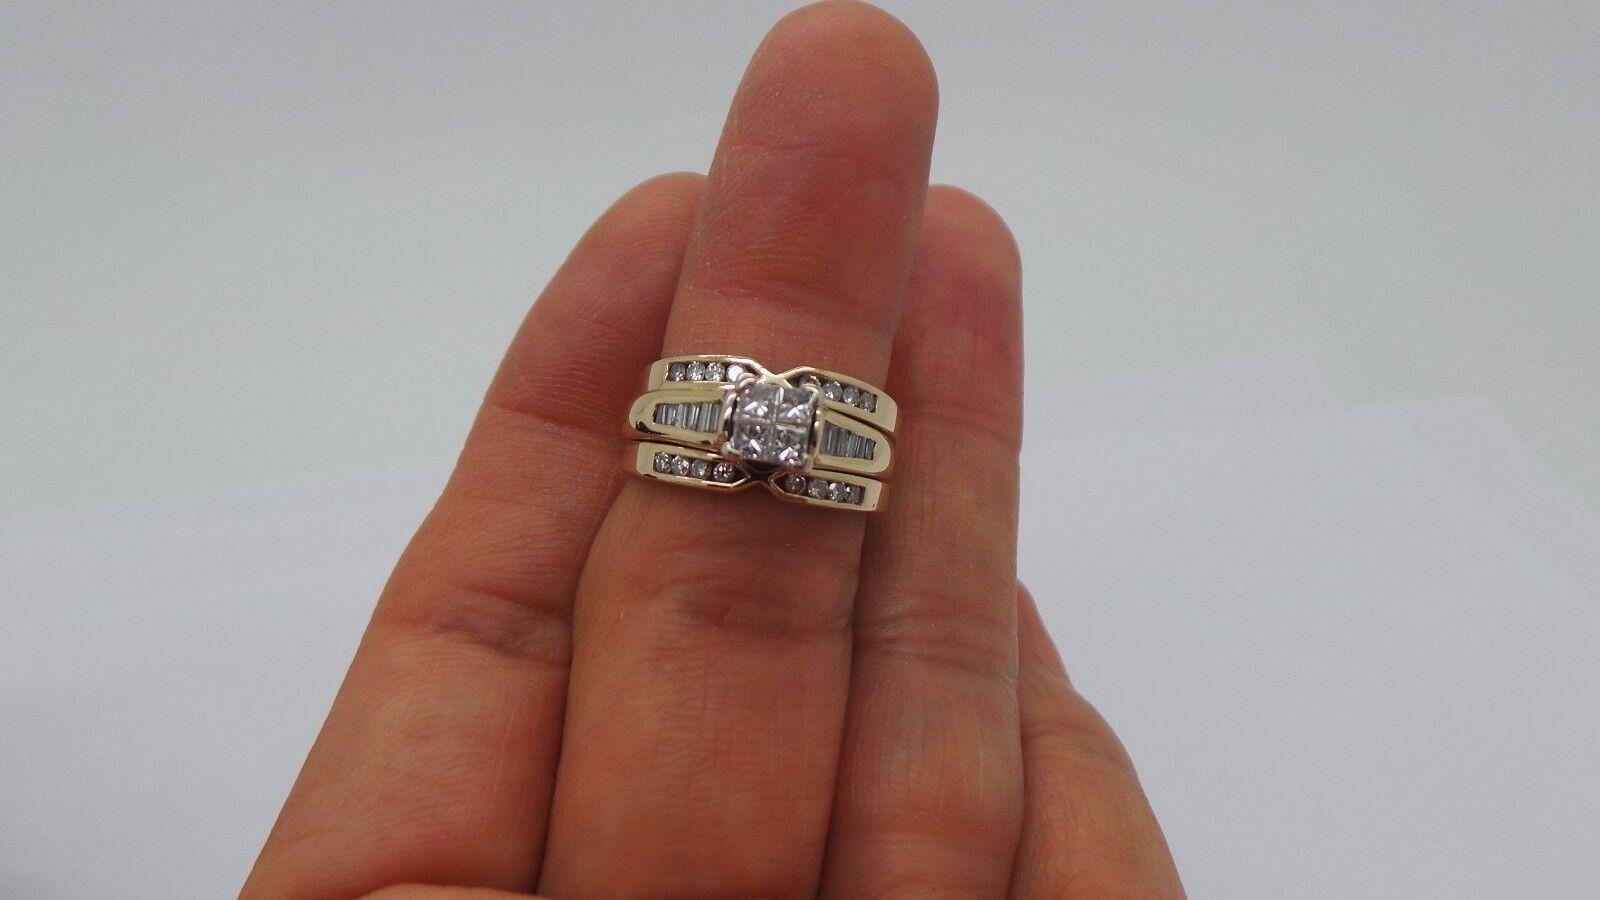 STUNNING 14K YG PRINCESS CUT DIAMOND BRIDAL SET SZ 6.75 1.00 tcw A7296-1 8.0 grm